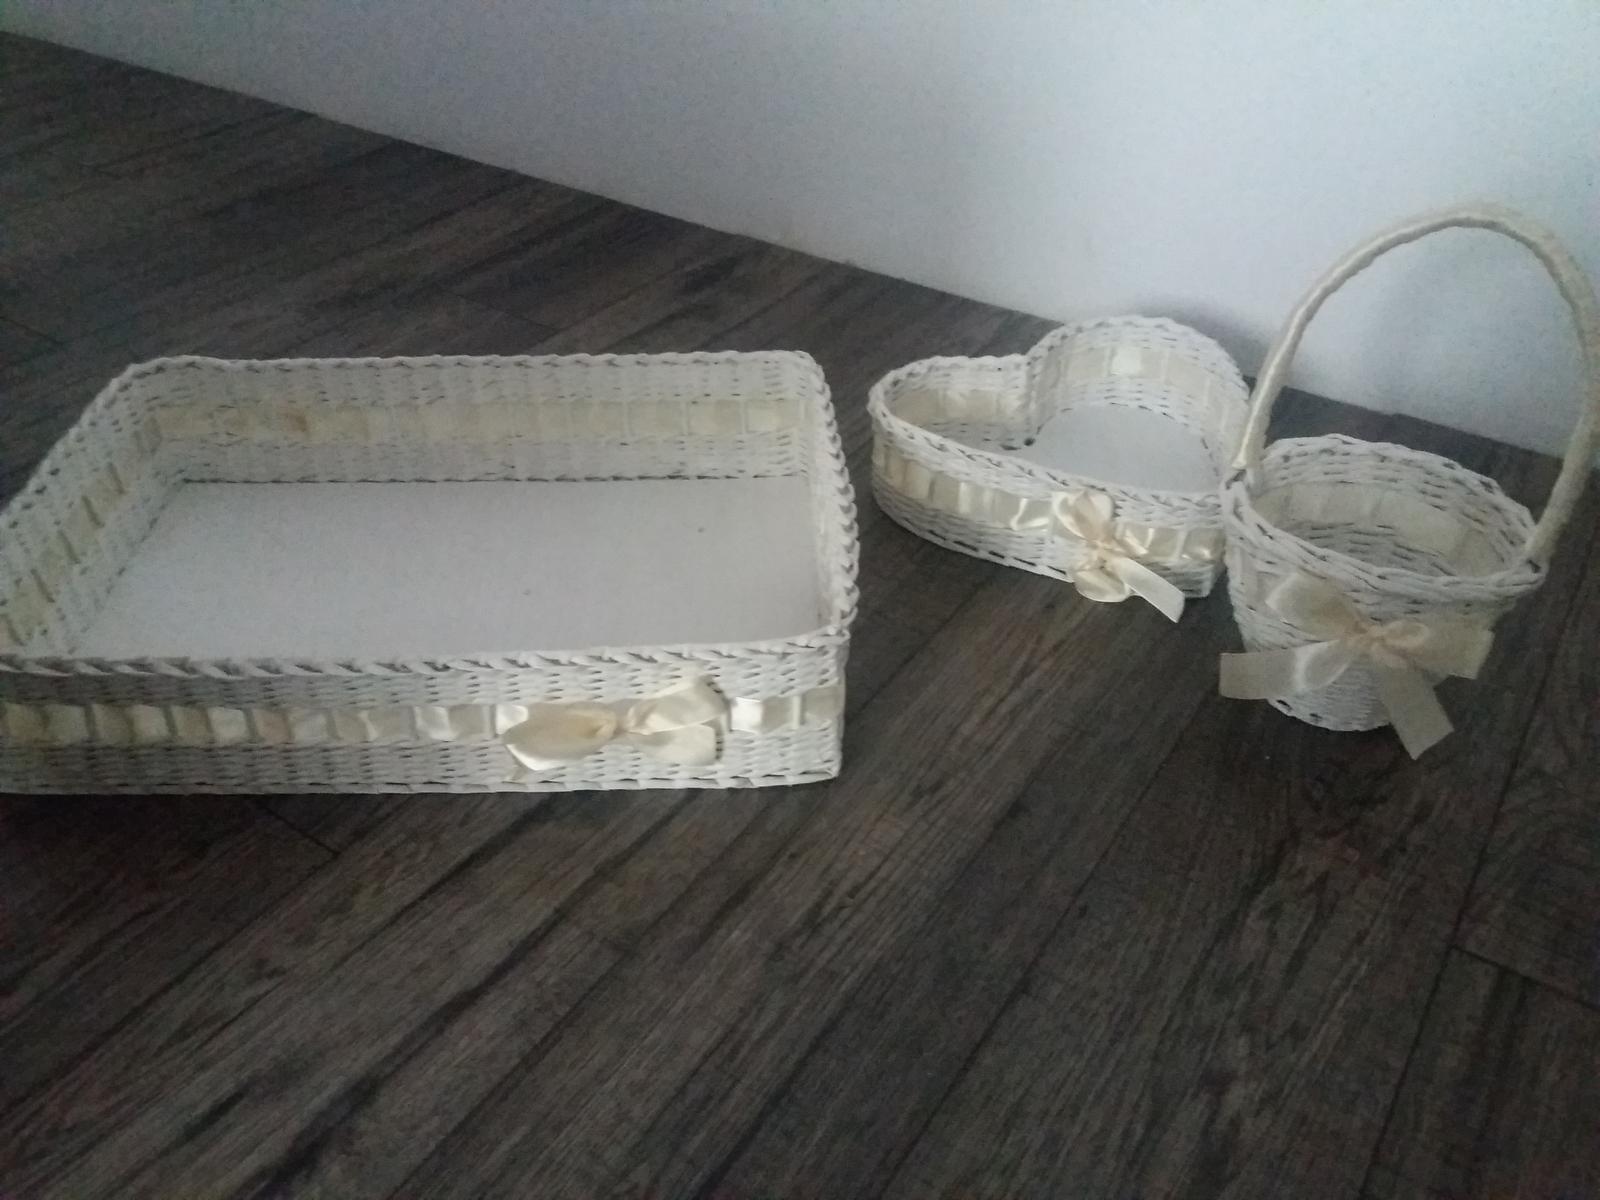 svadobné košíky na pierka/zákusky/lupene - Obrázok č. 2